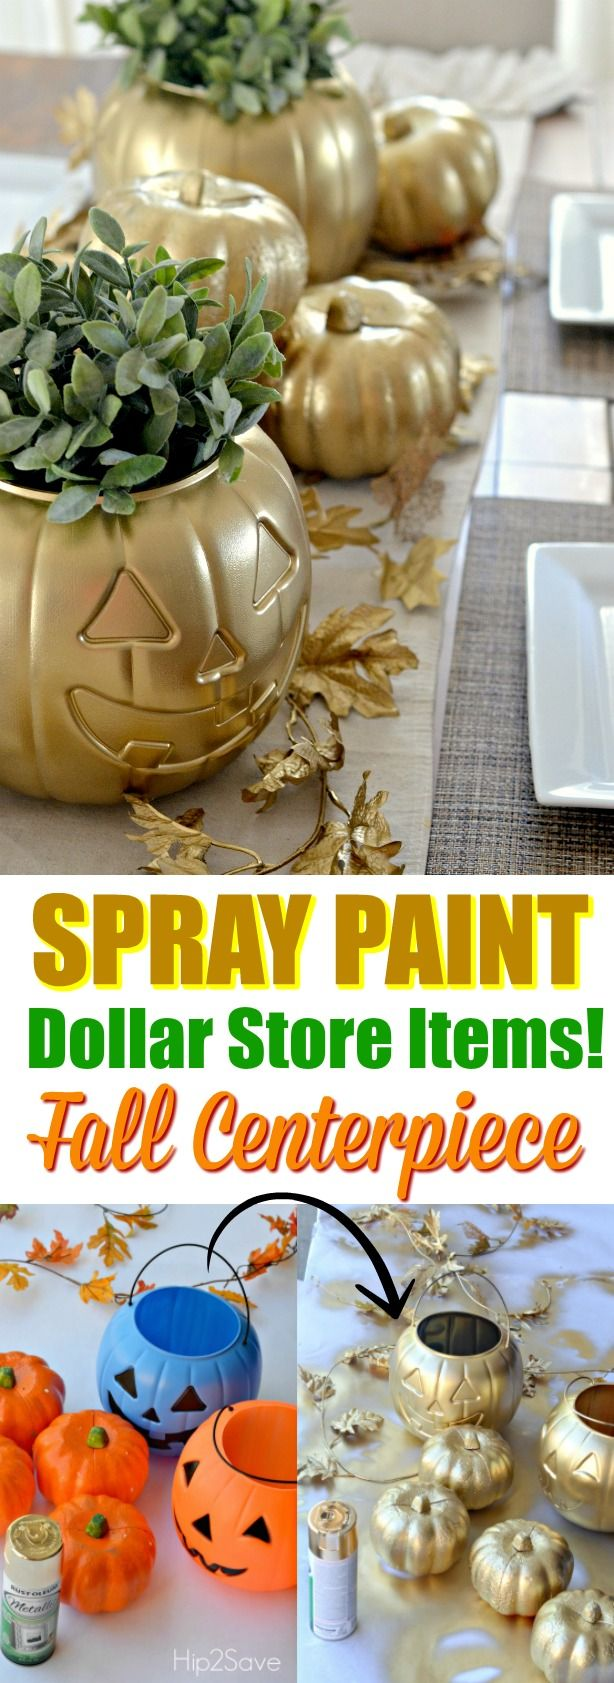 Best 25+ Halloween bathroom decorations ideas only on Pinterest ...